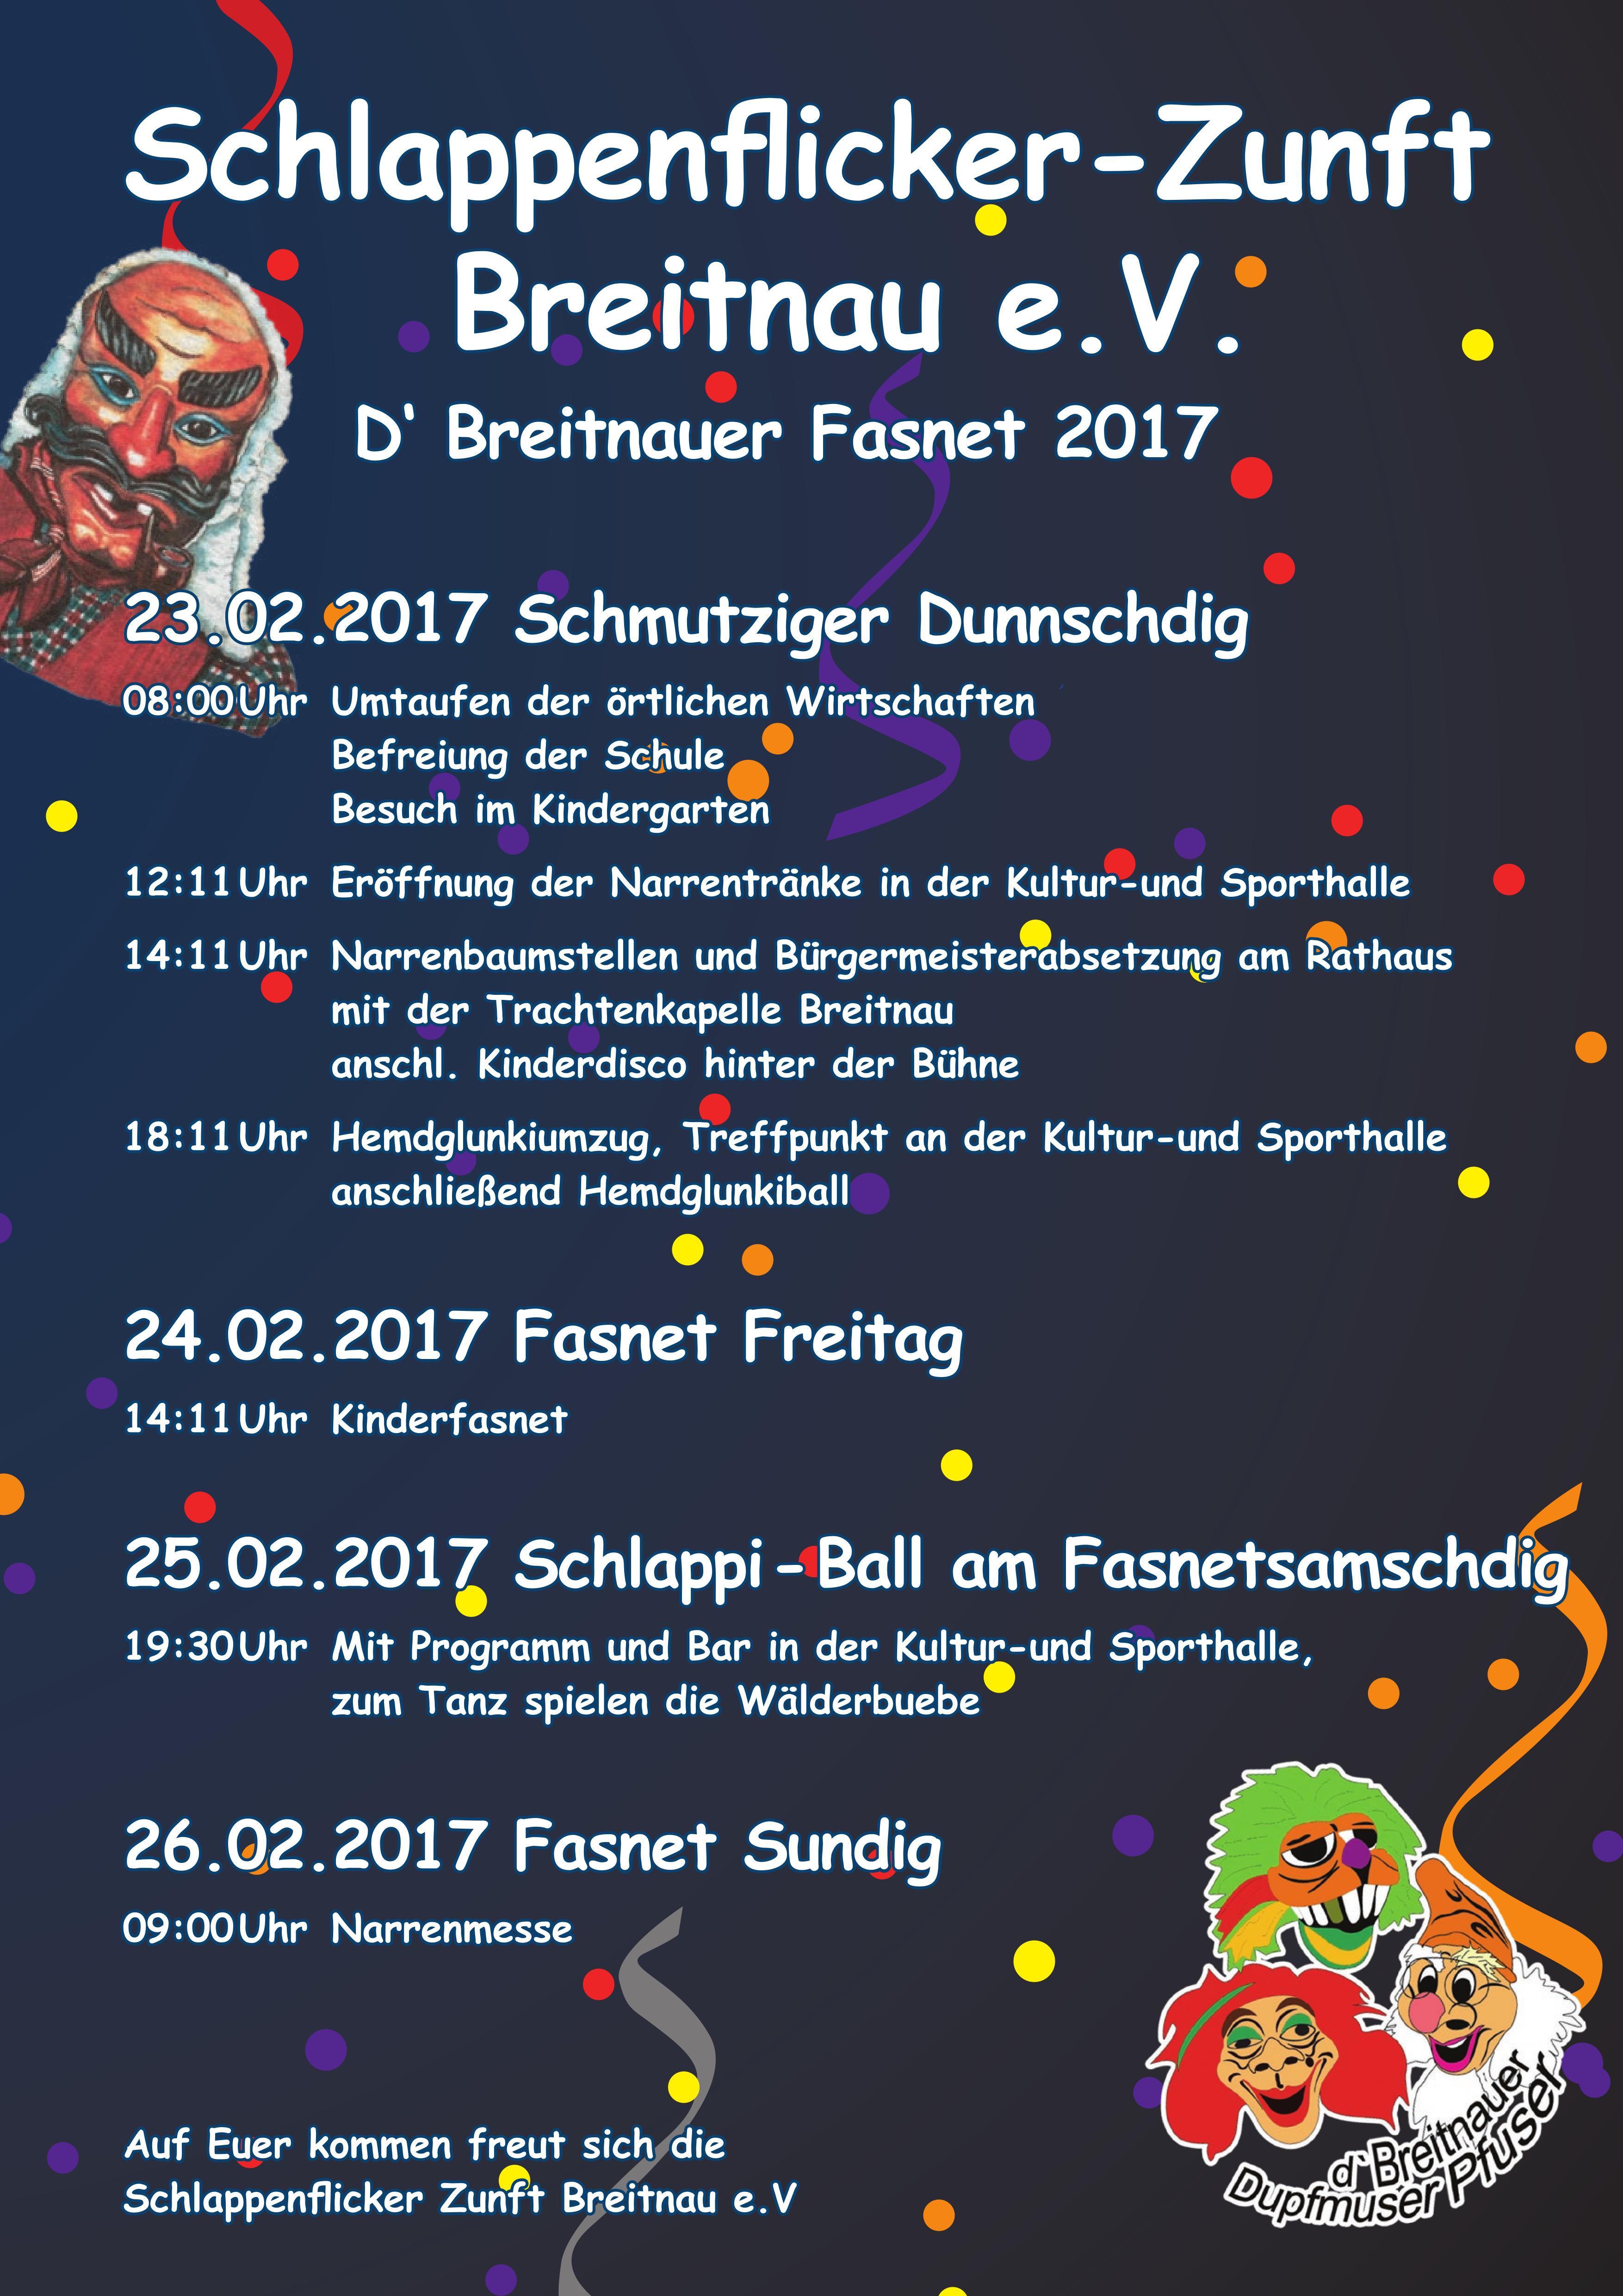 Fasnet 2017 in Breitnau